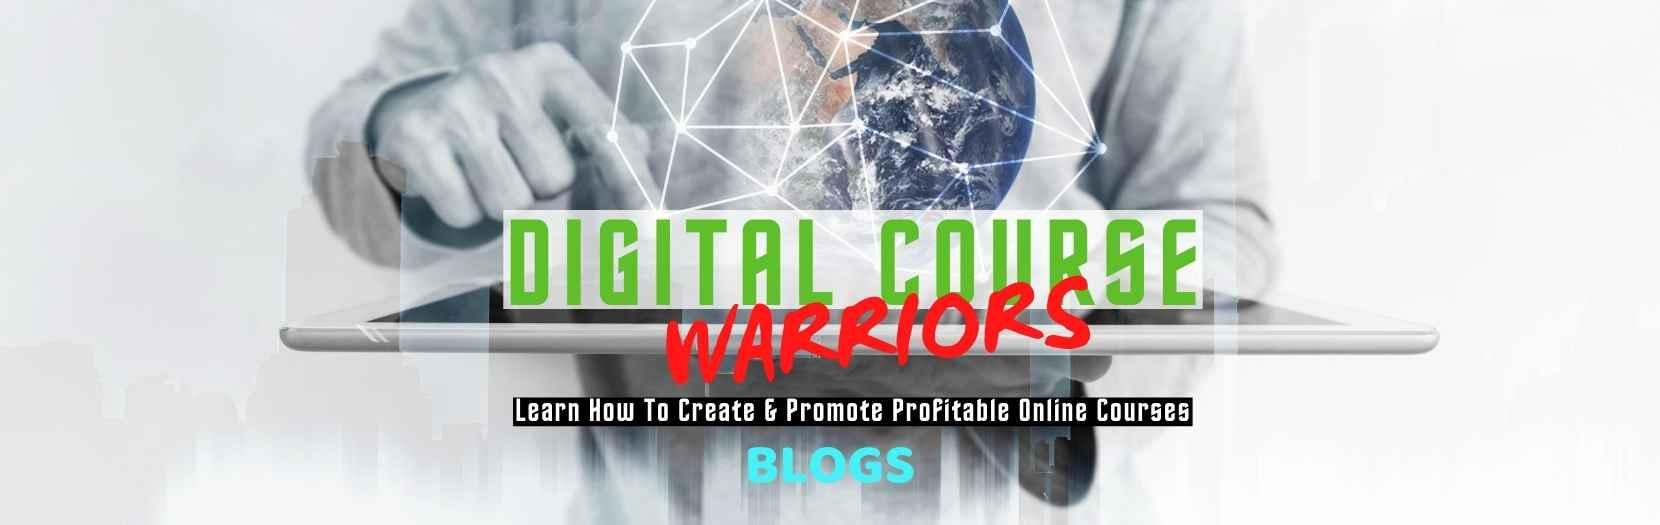 Digital Course Warriors_Blog_Banner_1600x525_v1_0